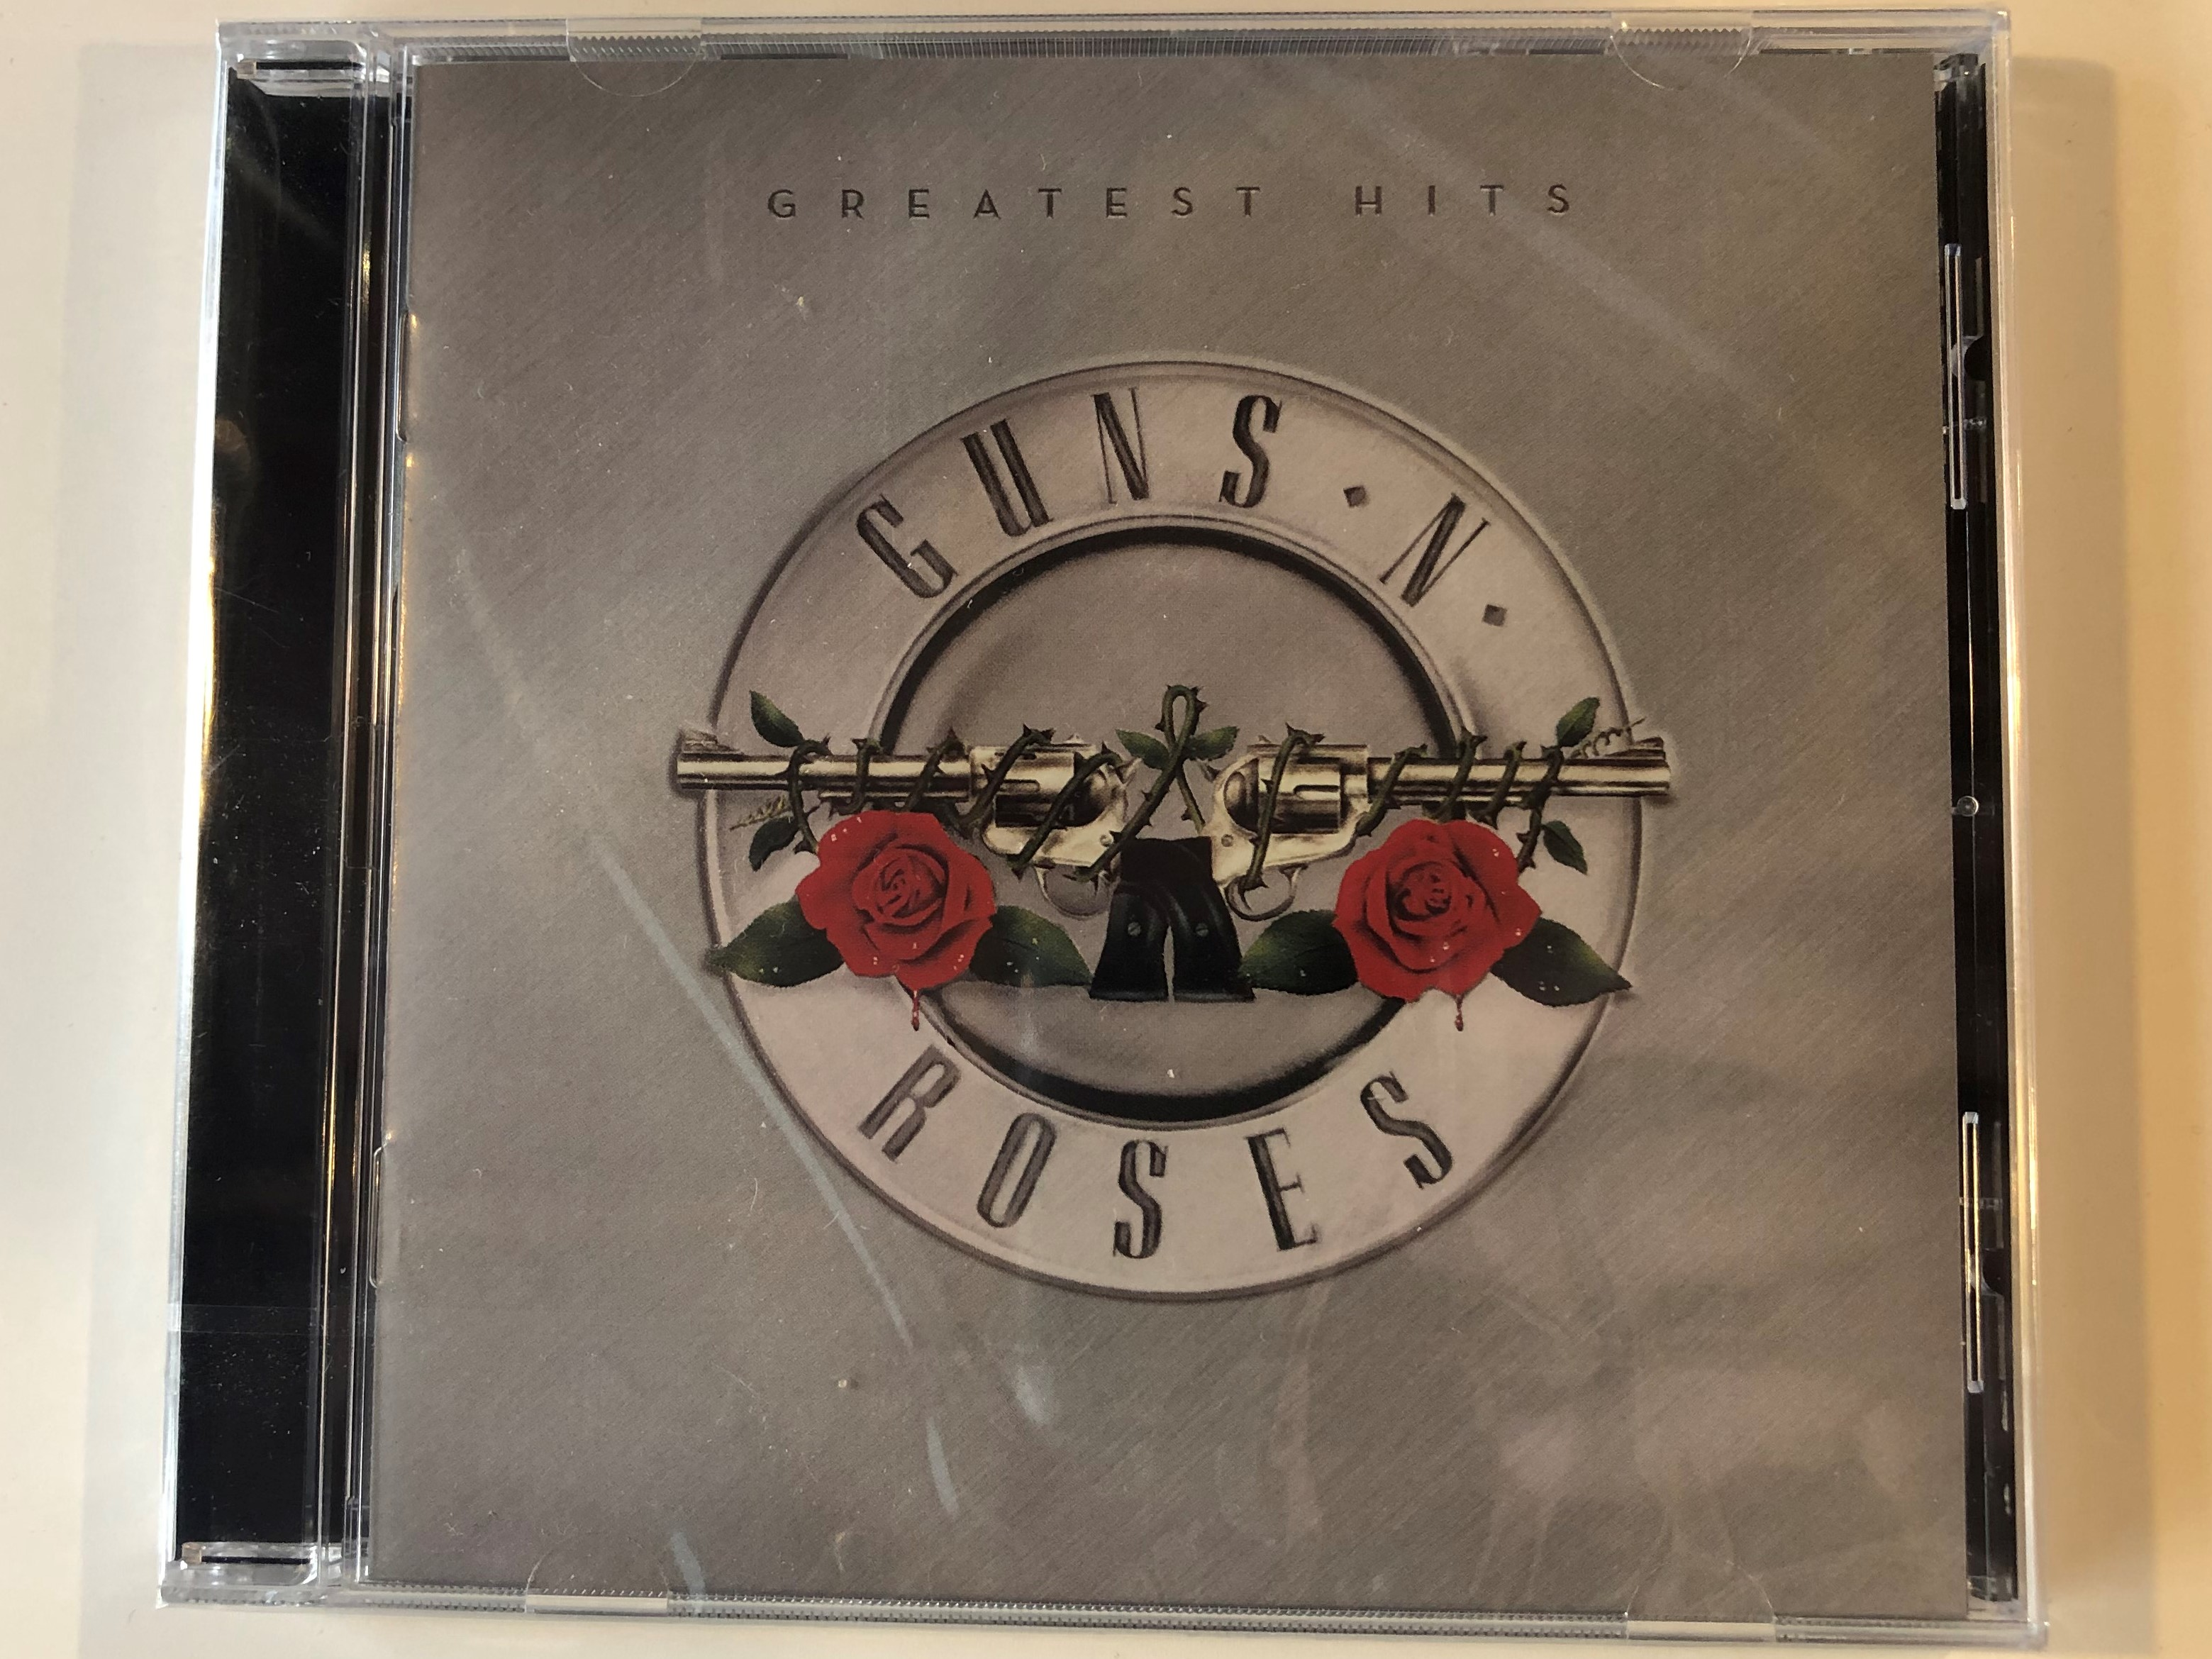 guns-n-roses-greatest-hits-geffen-records-audio-cd-2004-0602498621080-1-.jpg